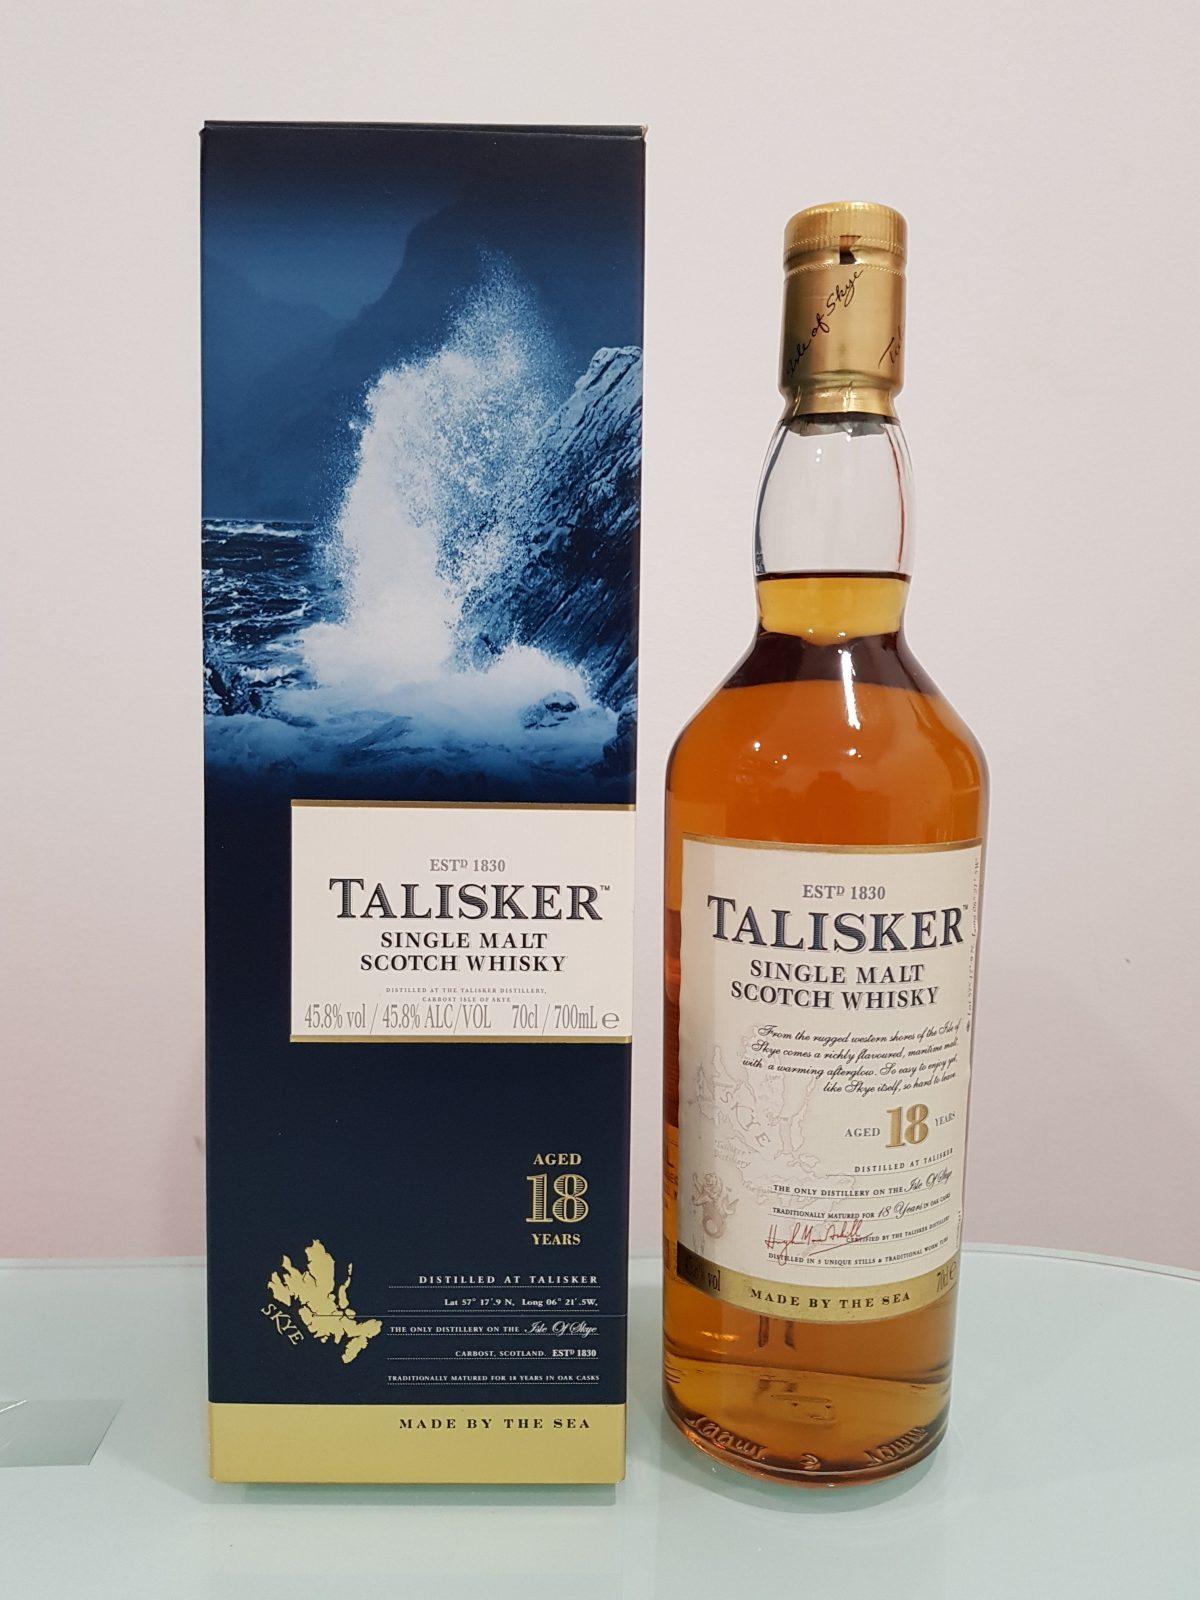 Talisker 18 Year Old Single Malt Scotch Whisky 700ml 45.8 % abv